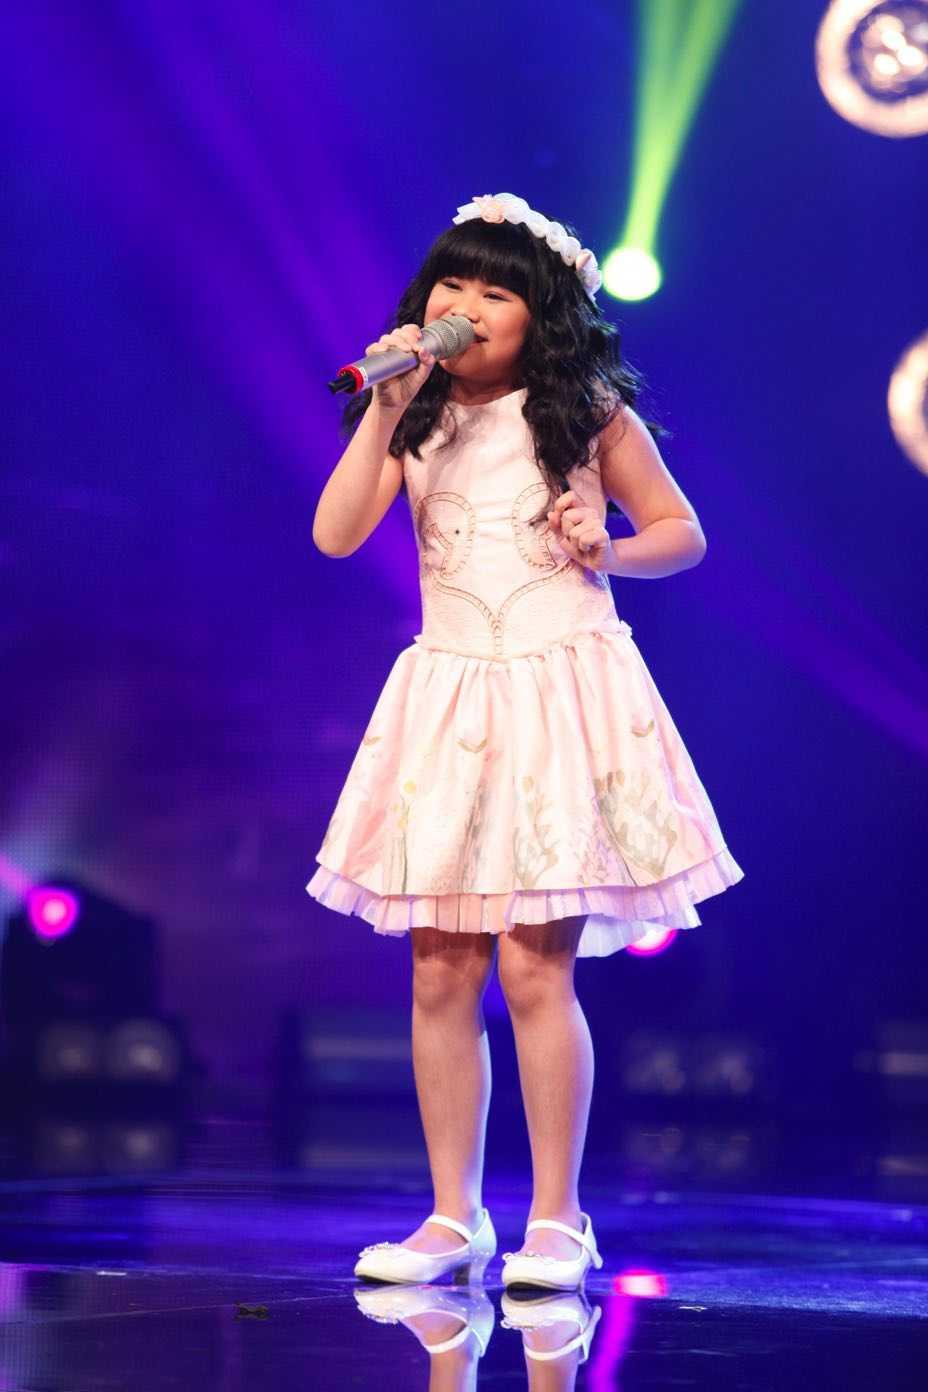 Truc tiep liveshow top 10 Vietnam Idol Kids: 10 'thien than nho' da san sang hinh anh 10